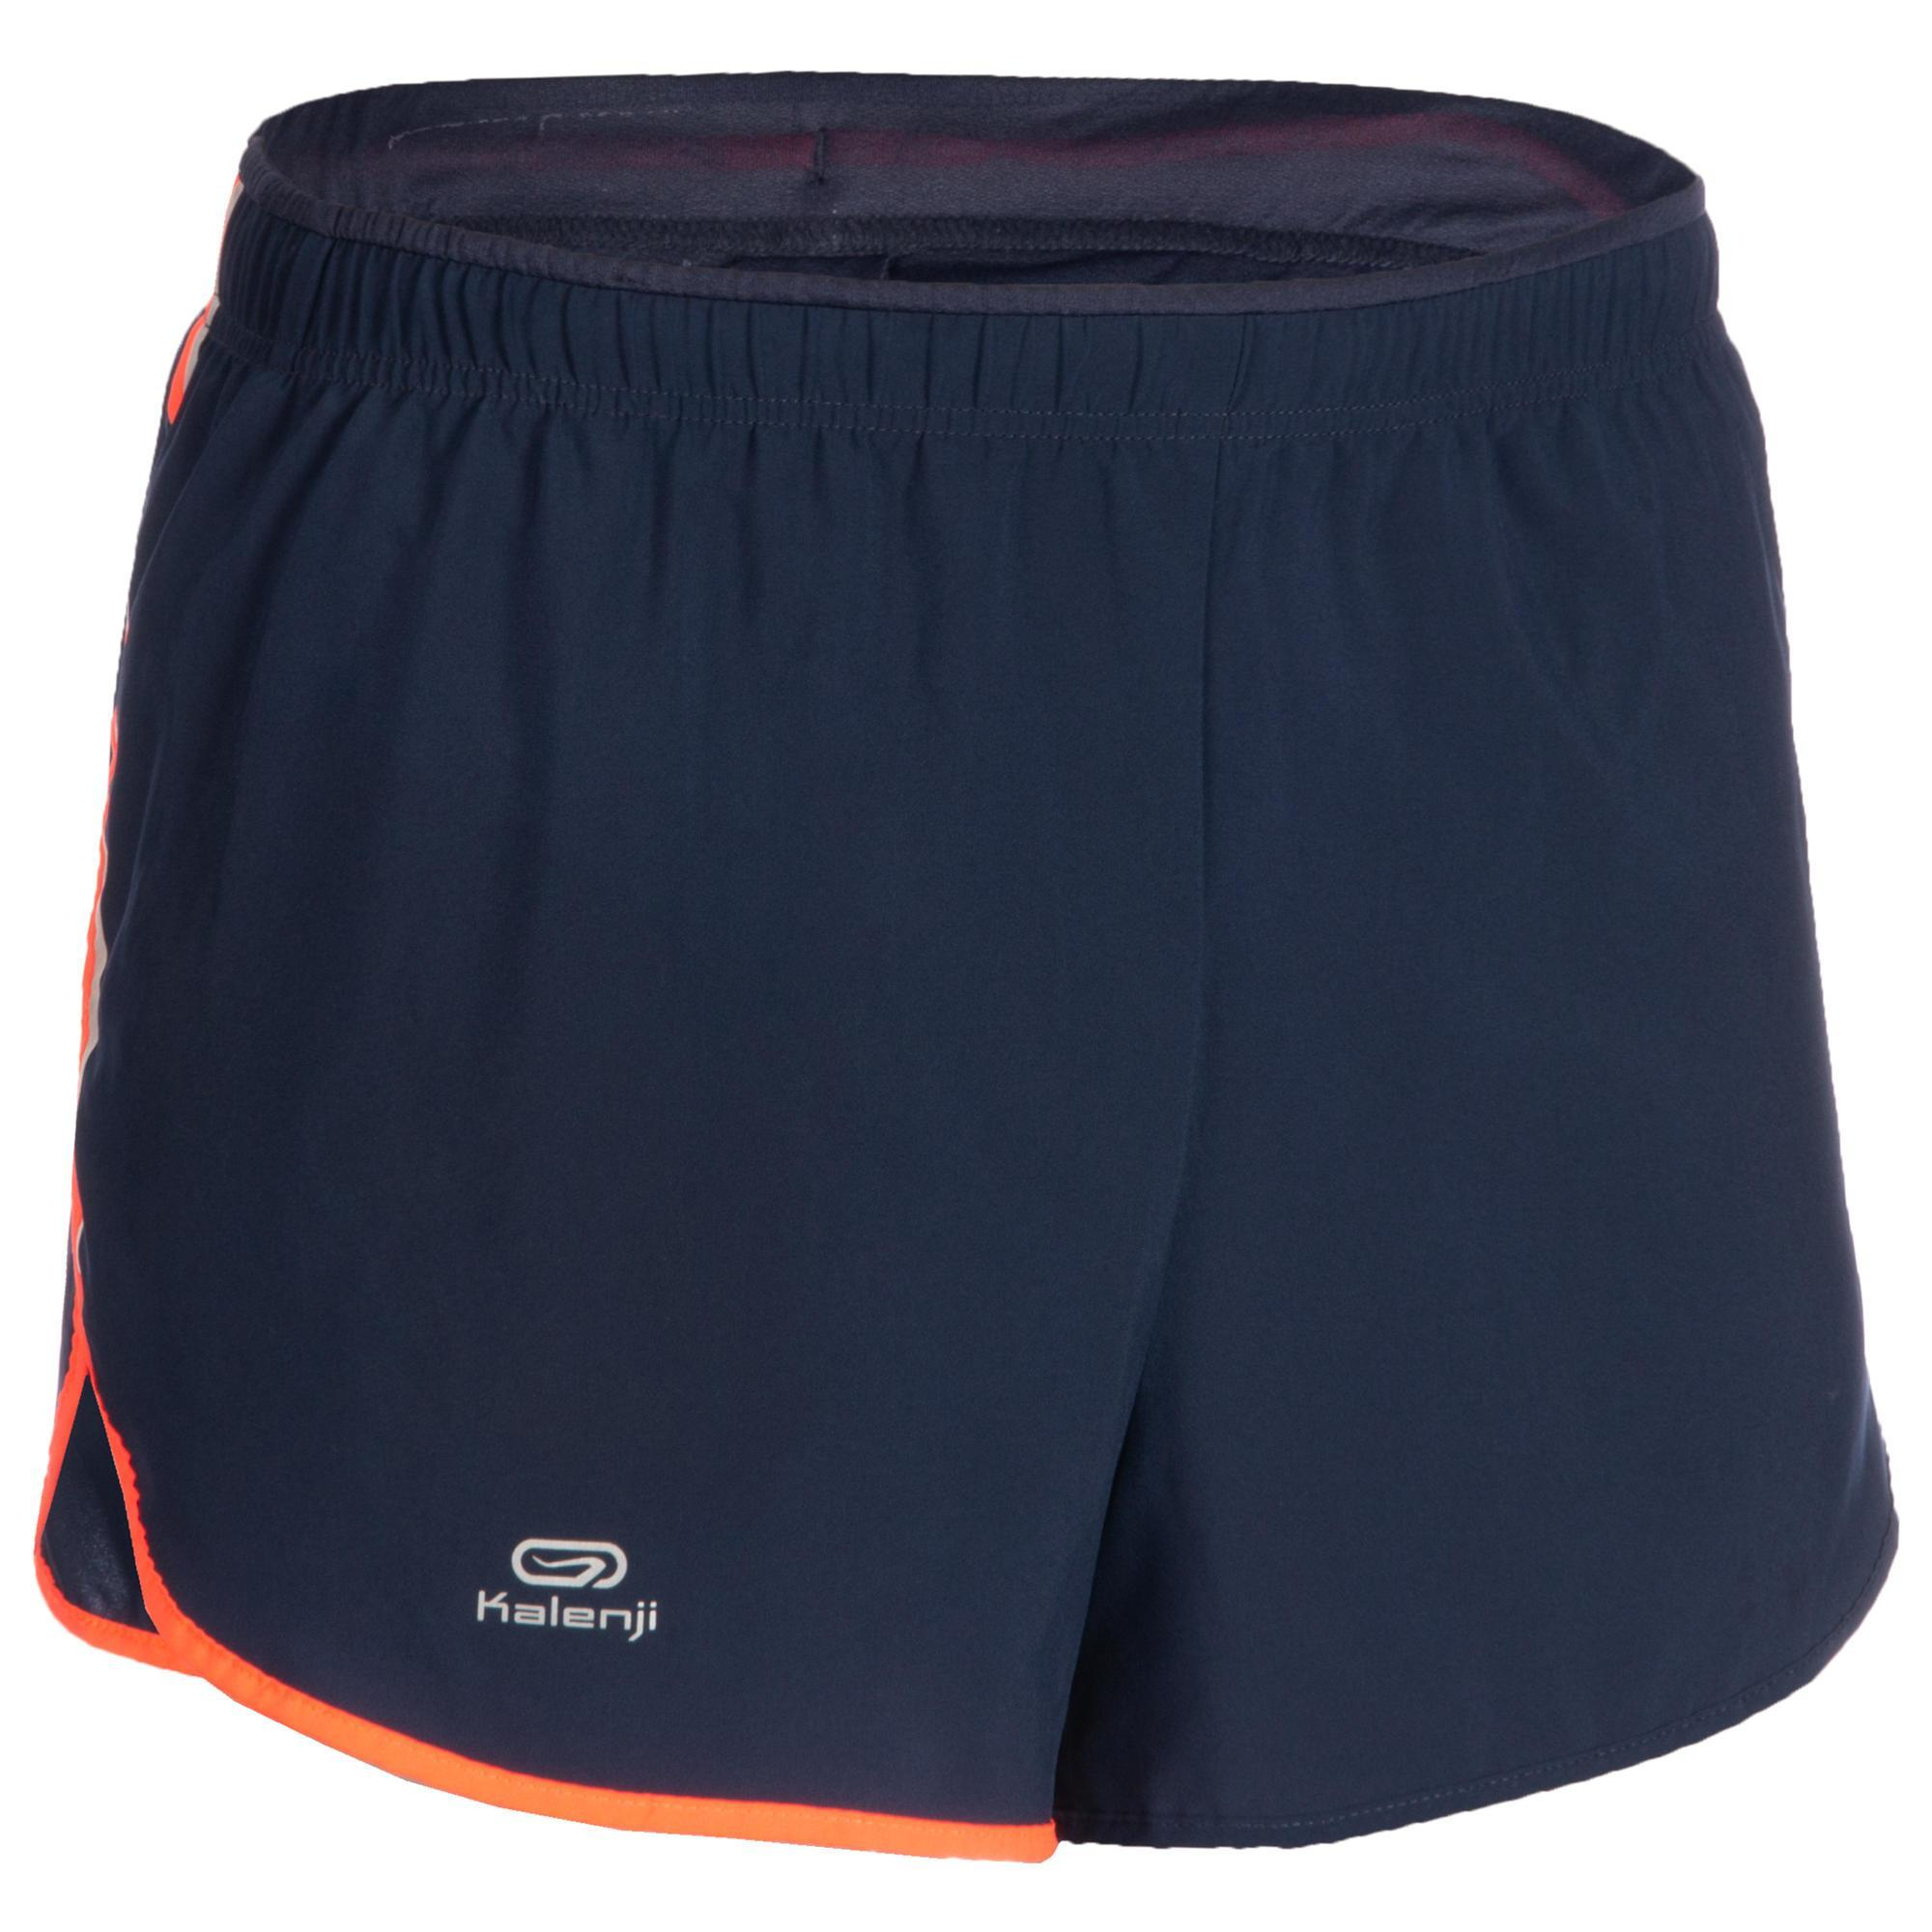 Laufshorts Herren blau/orange | Sportbekleidung > Sporthosen > Laufhosen | Kalenji